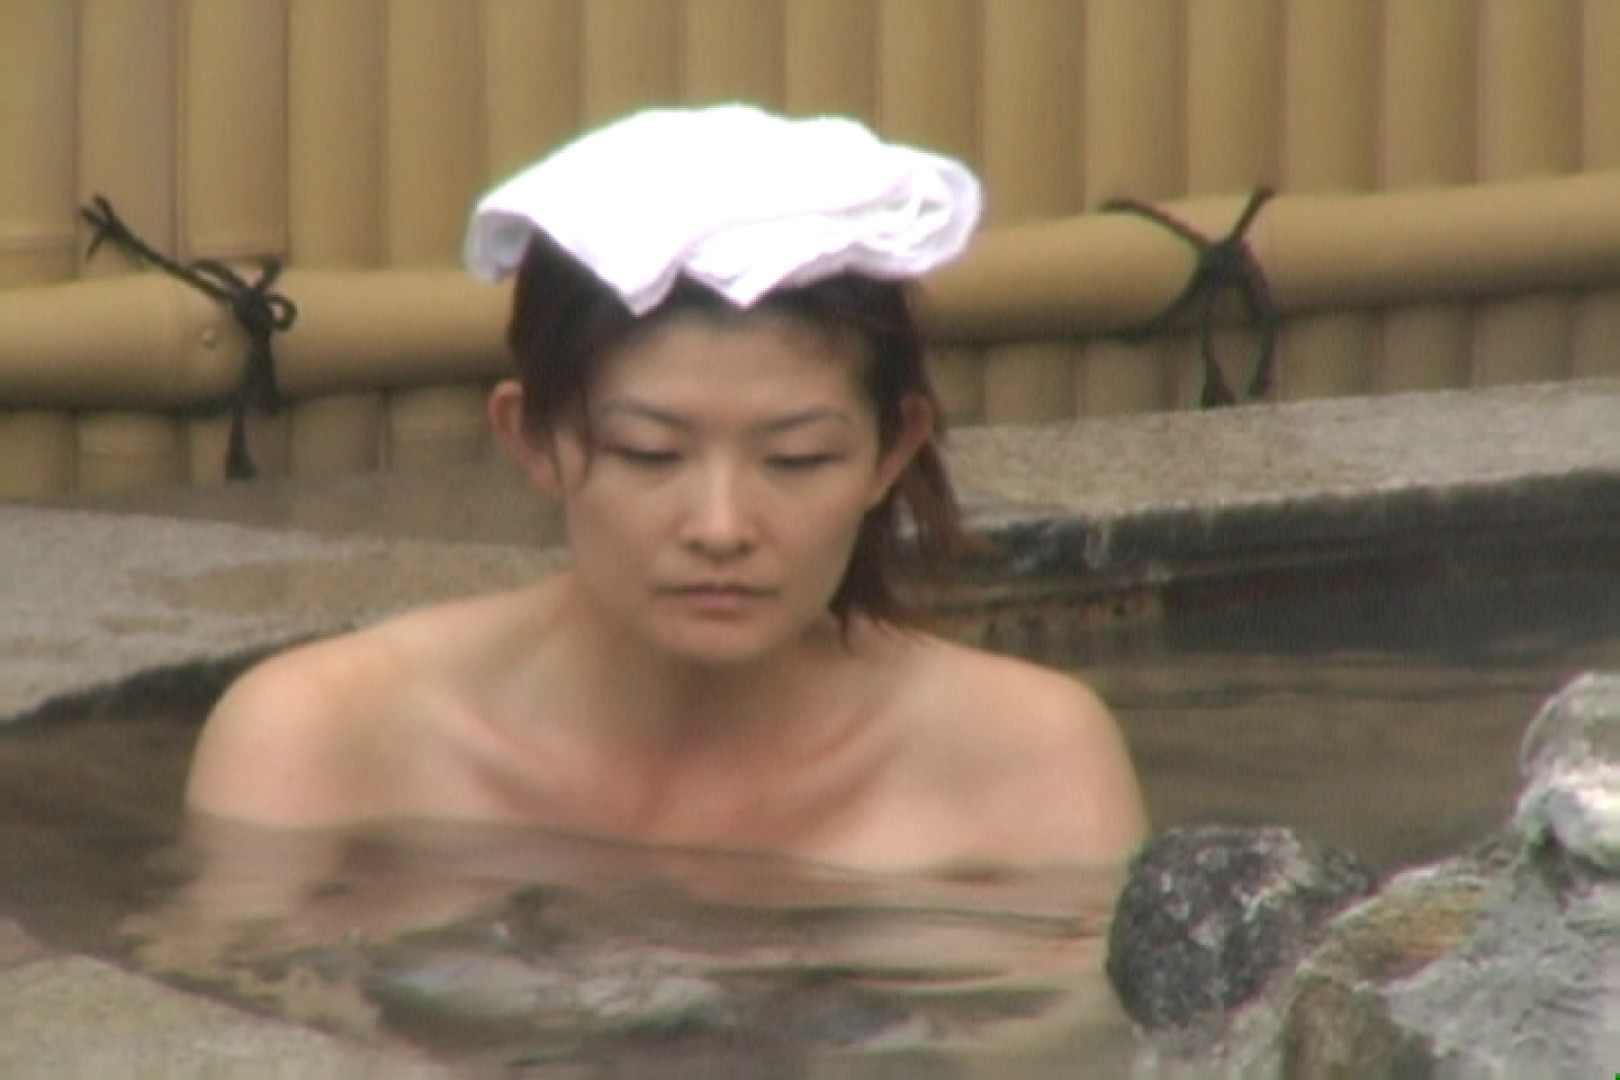 Aquaな露天風呂Vol.611 露天風呂編 | 盗撮シリーズ  97PIX 81